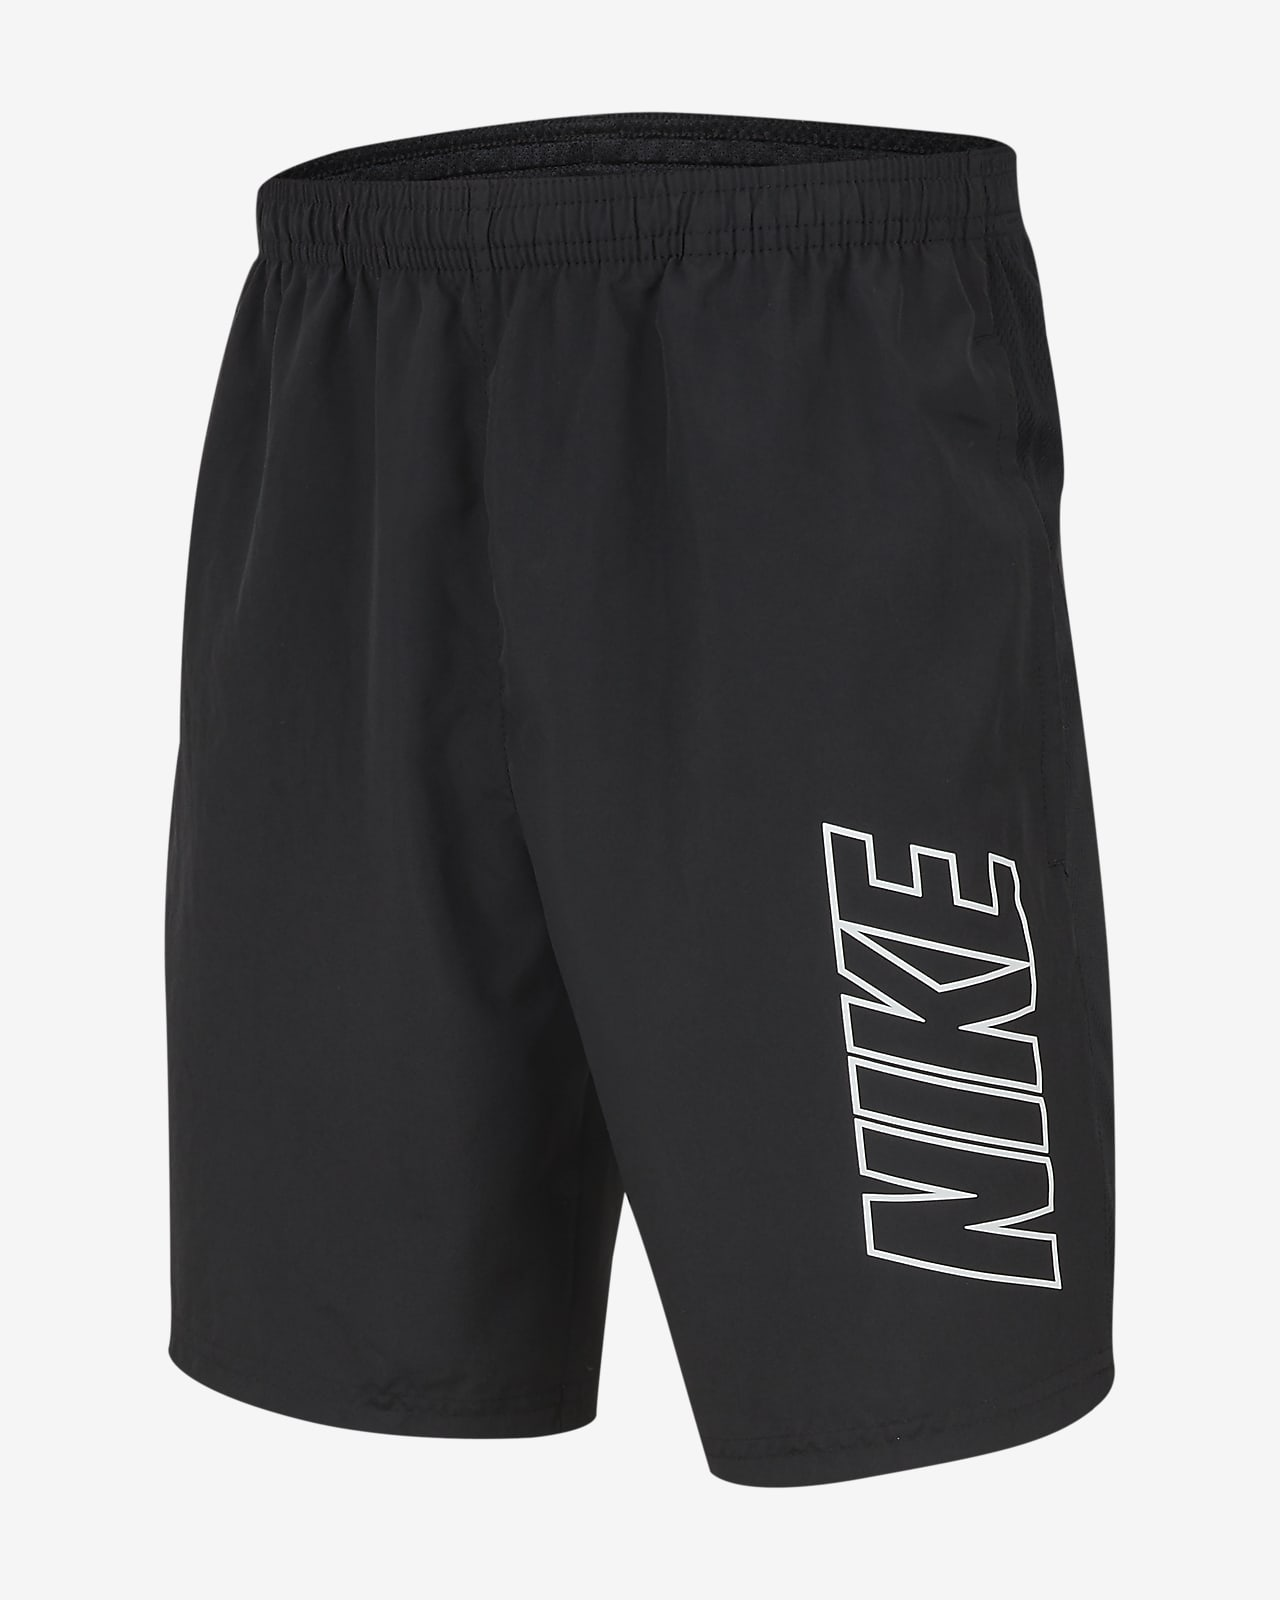 Shorts da calcio Nike Dri-FIT Academy - Ragazzi